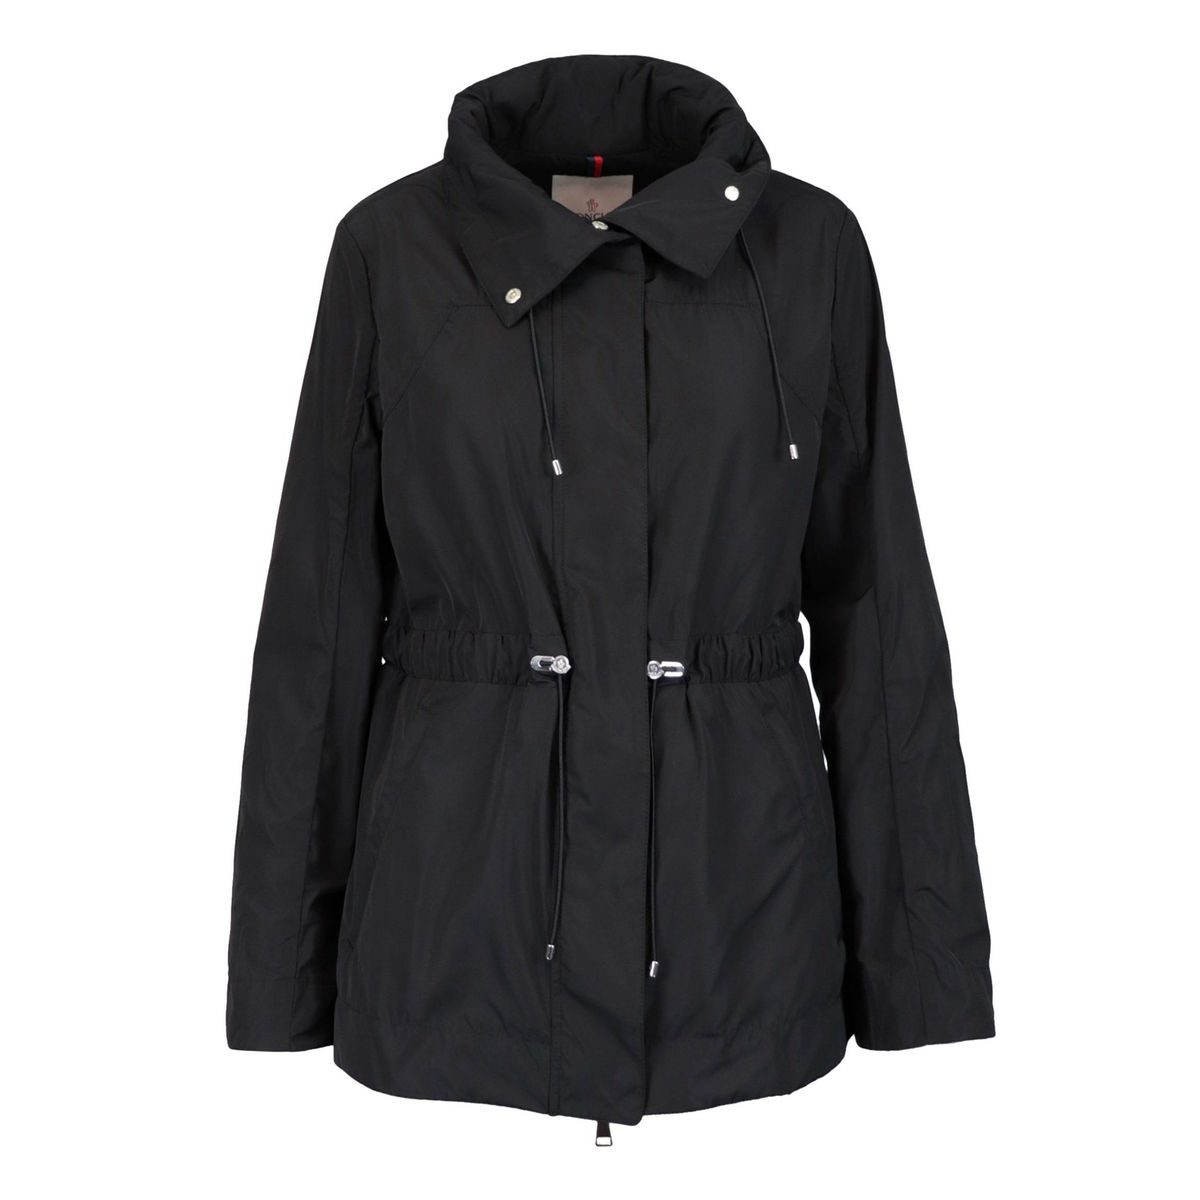 Nylon jacket with drawstring waist Black Moncler